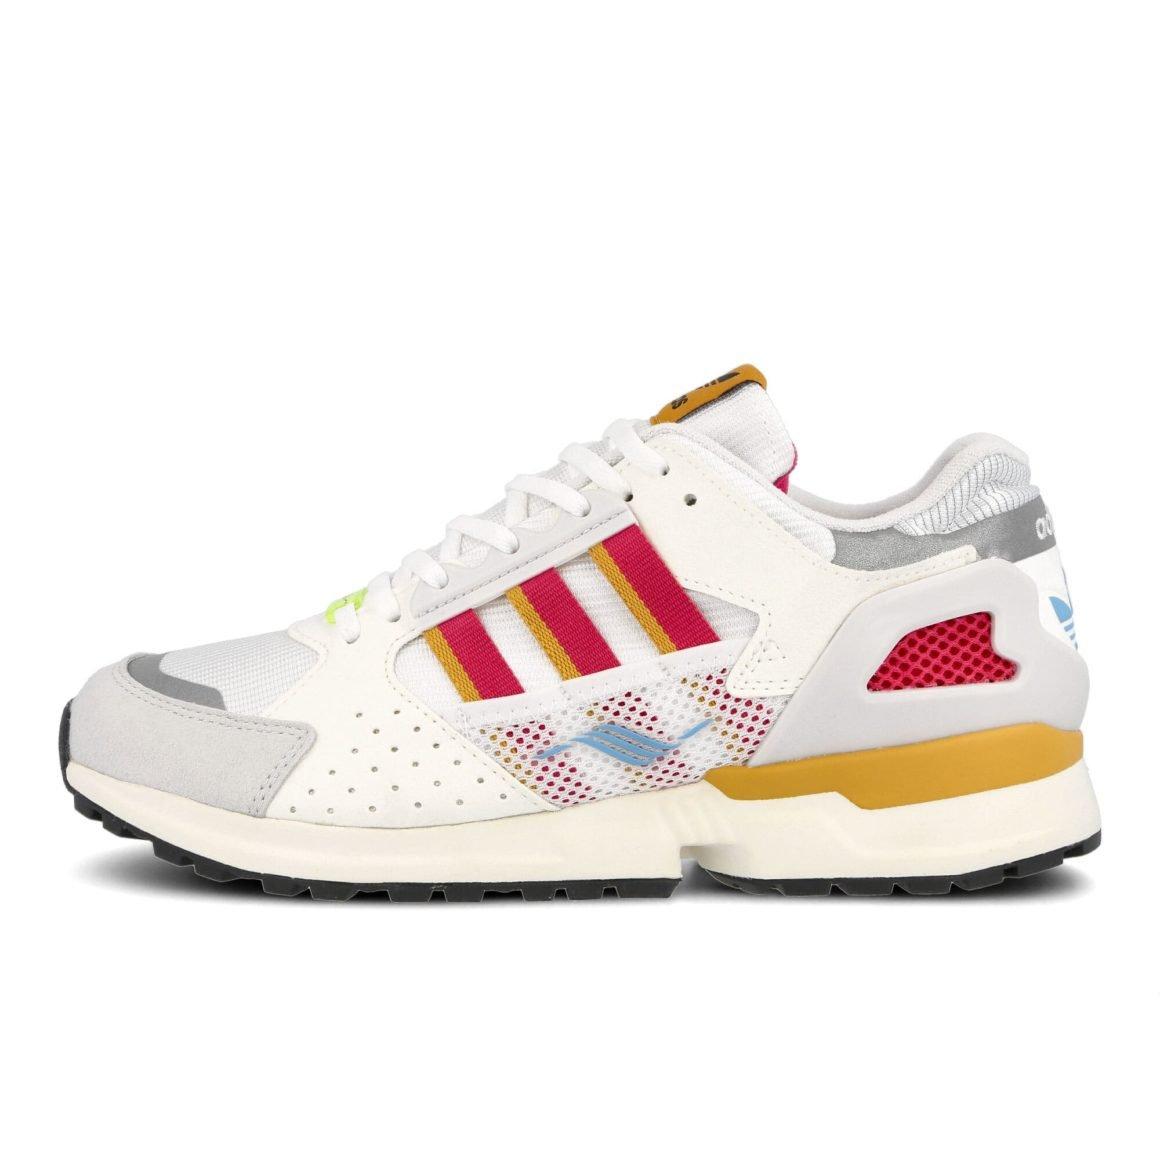 adidas_zx_10_000_c_fv6308